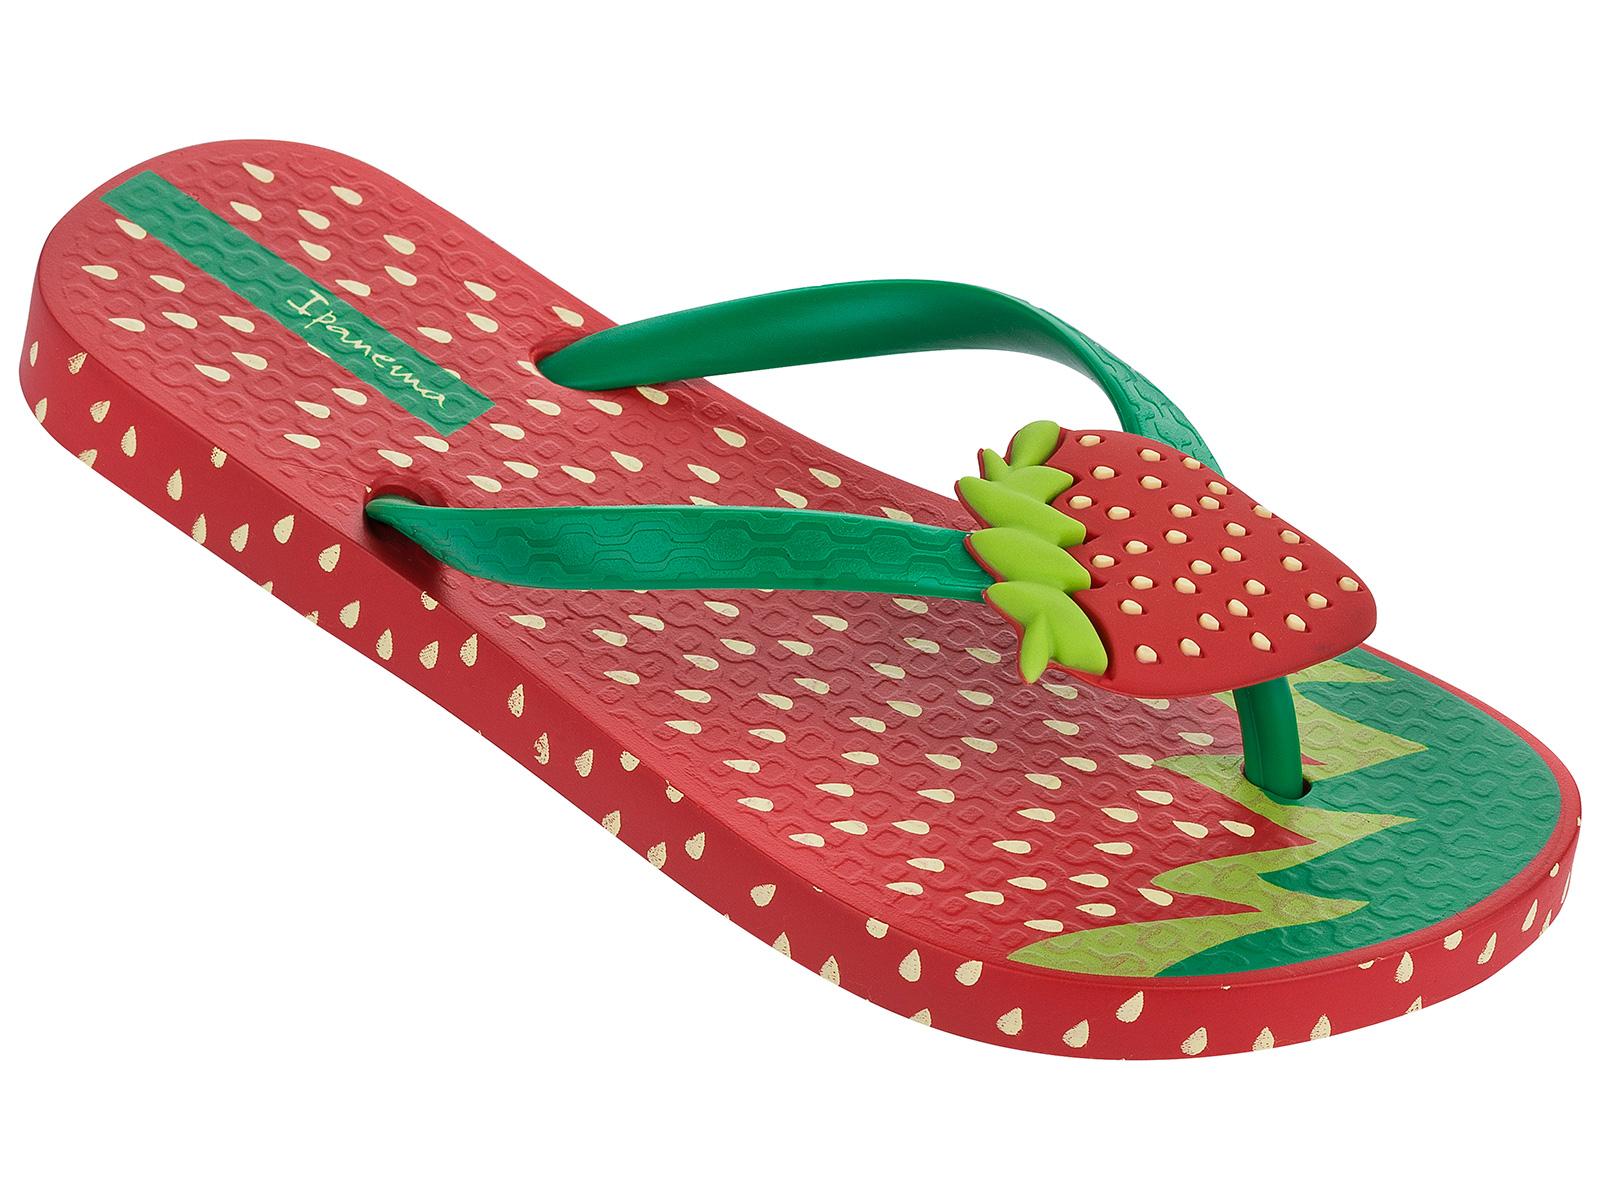 ipanema zehentrenner ipanema tutti frutti kids red green. Black Bedroom Furniture Sets. Home Design Ideas